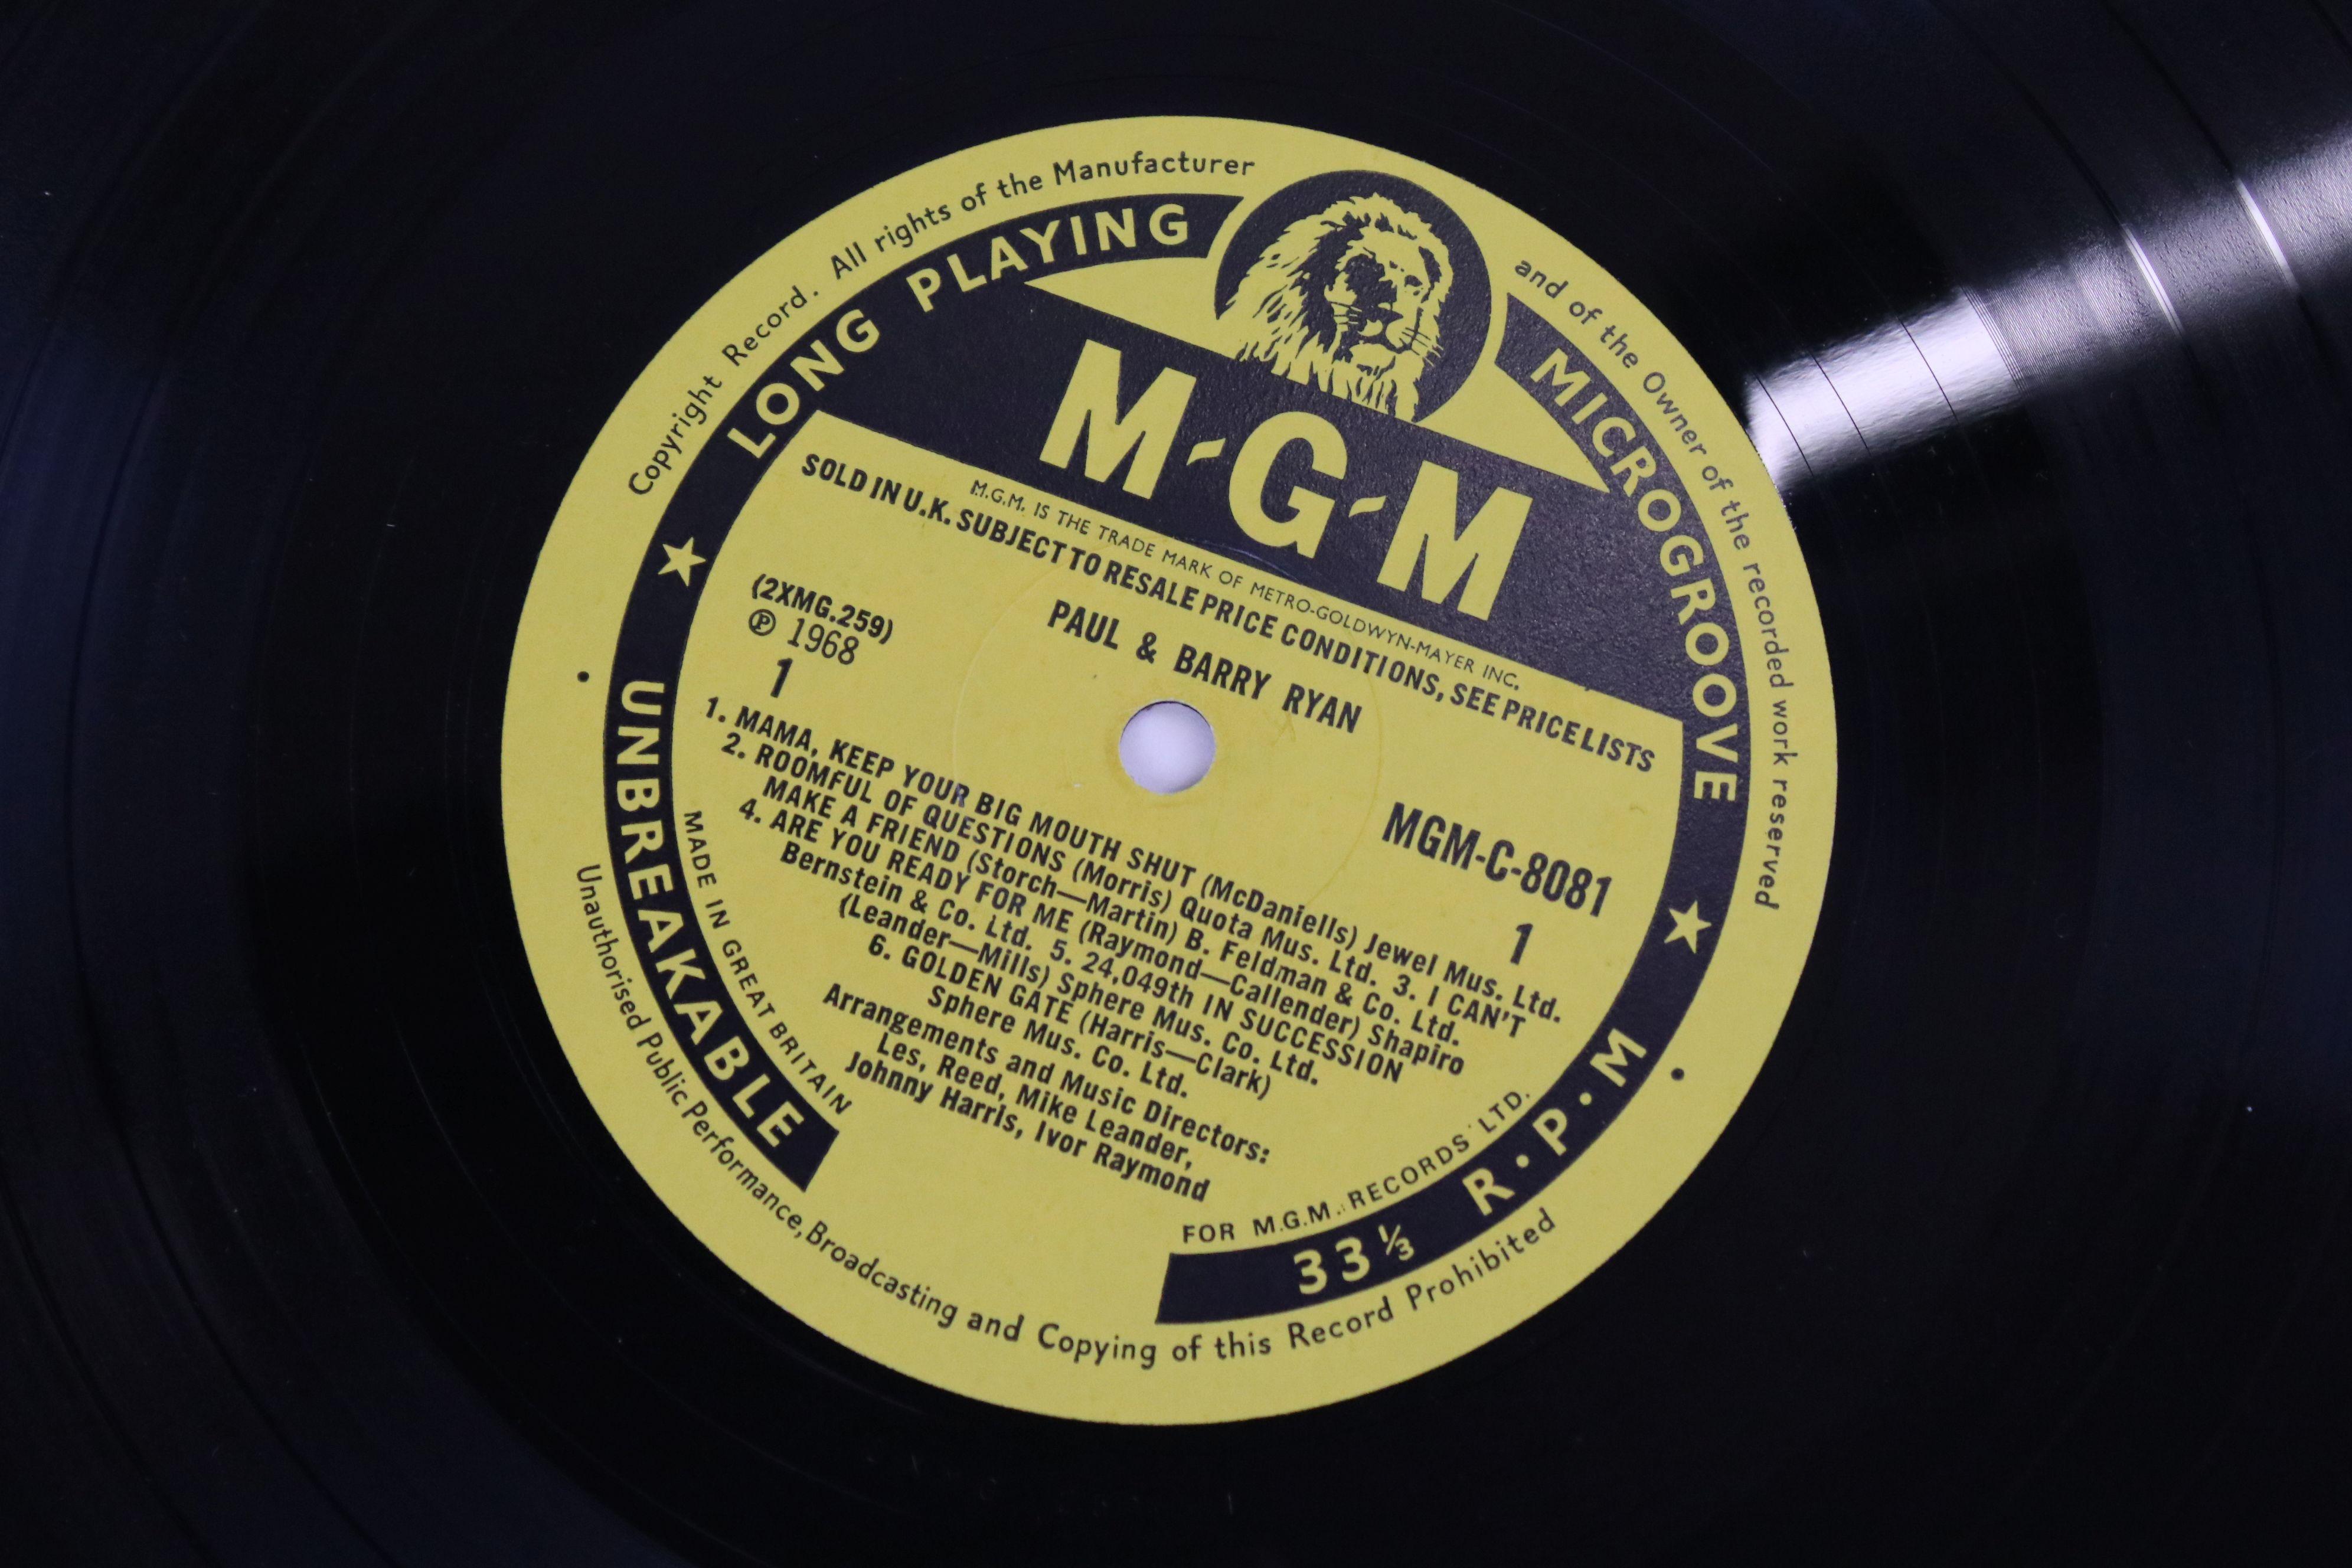 Vinyl - MOD/BEAT Paul & Barry Ryan self titled LP on MGM C 8081, mono non laminated, flip back - Image 5 of 5